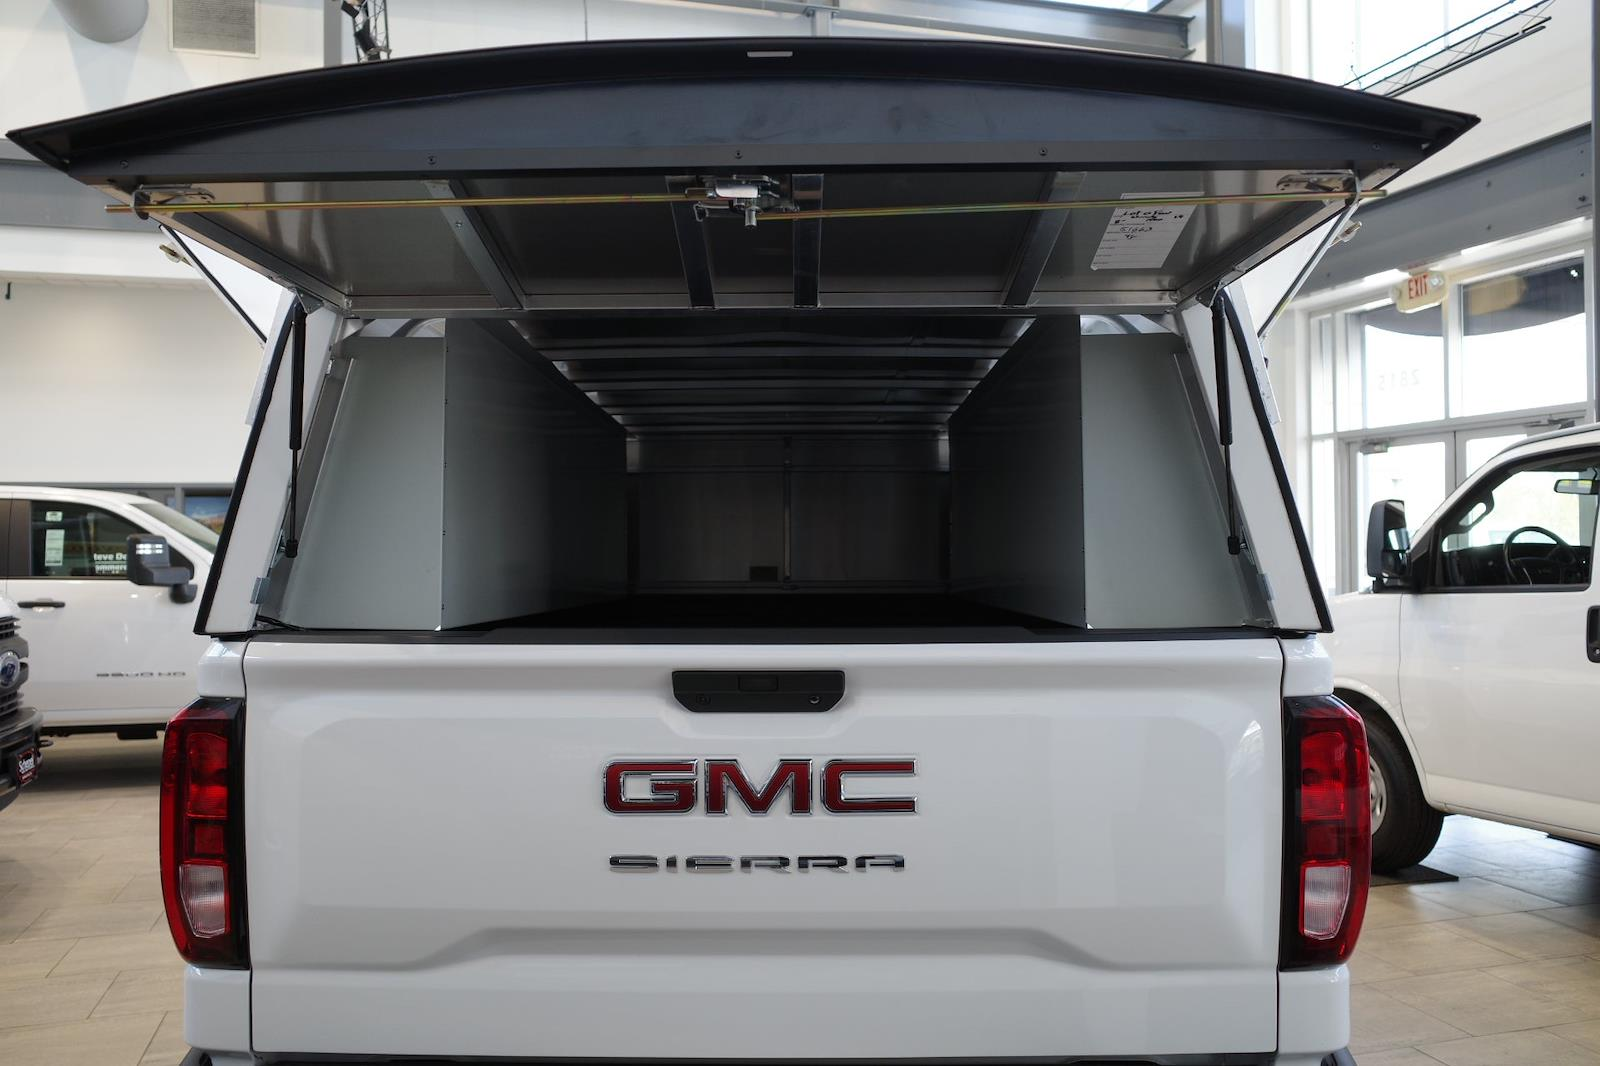 2021 GMC Sierra 1500 Regular Cab 4x2, Pickup #MT421 - photo 11